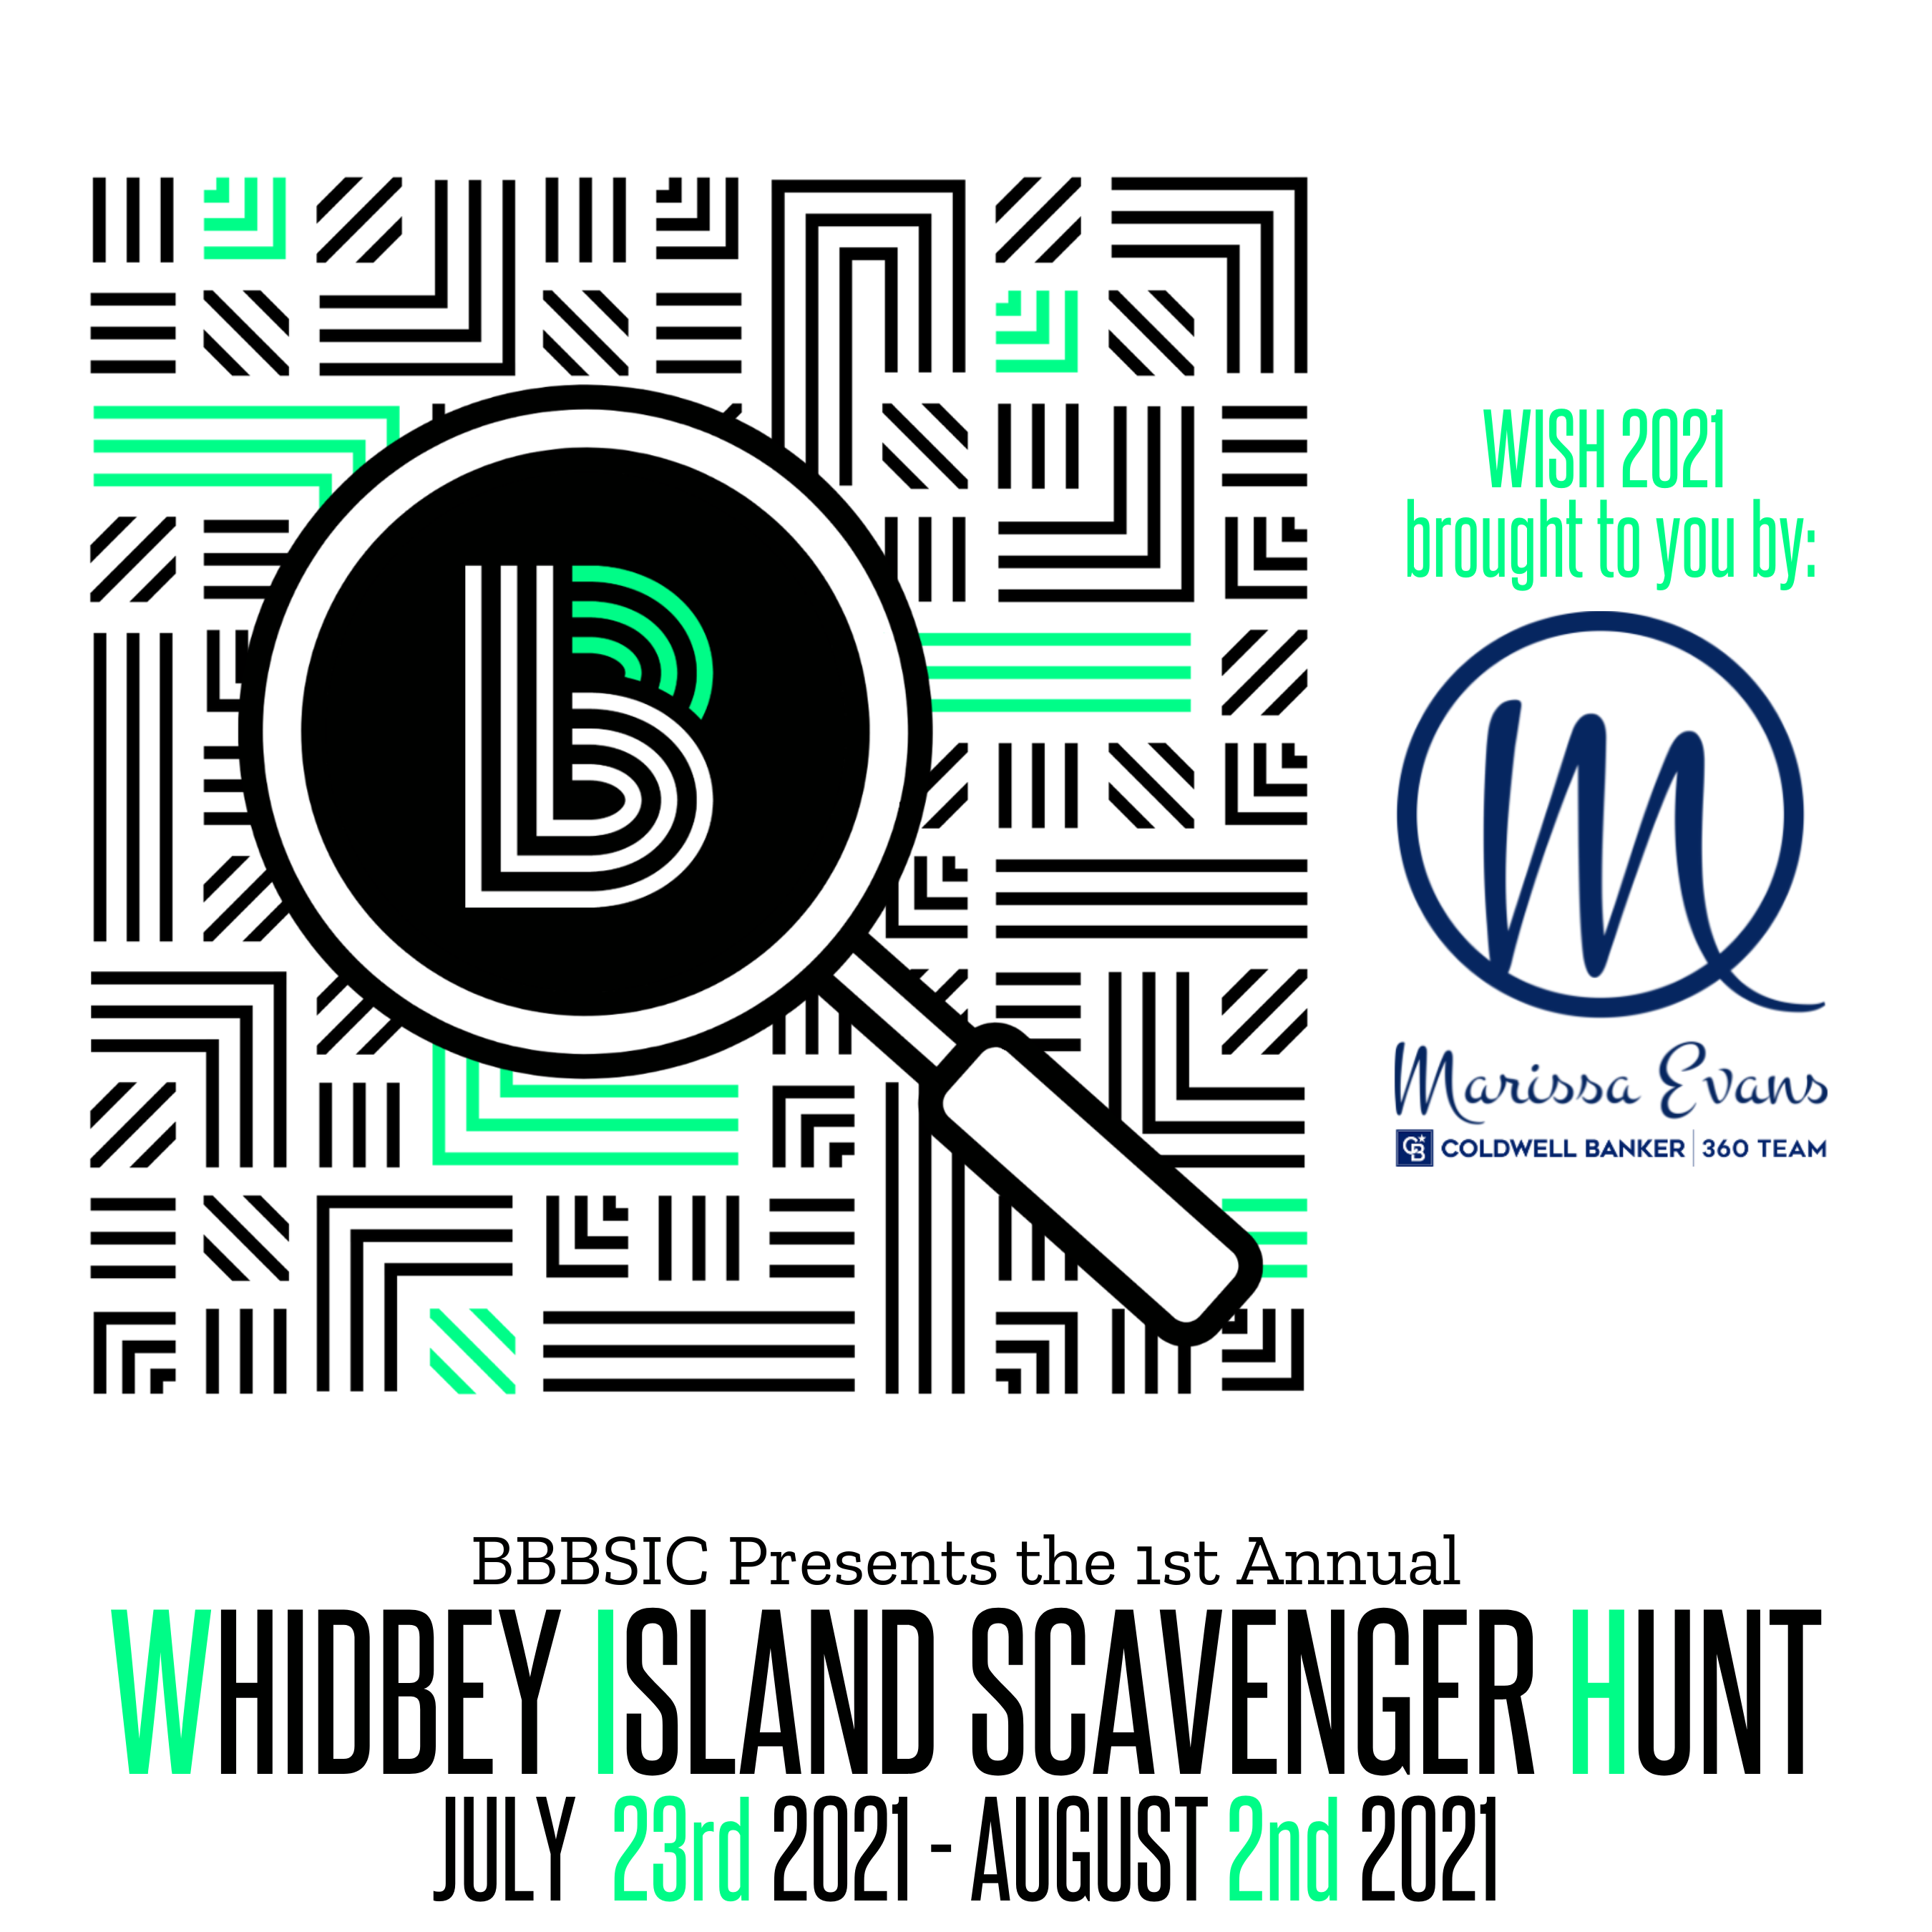 Big Brothers Big Sisters of Island County Whidbey Island Scavenger Hunt 2021